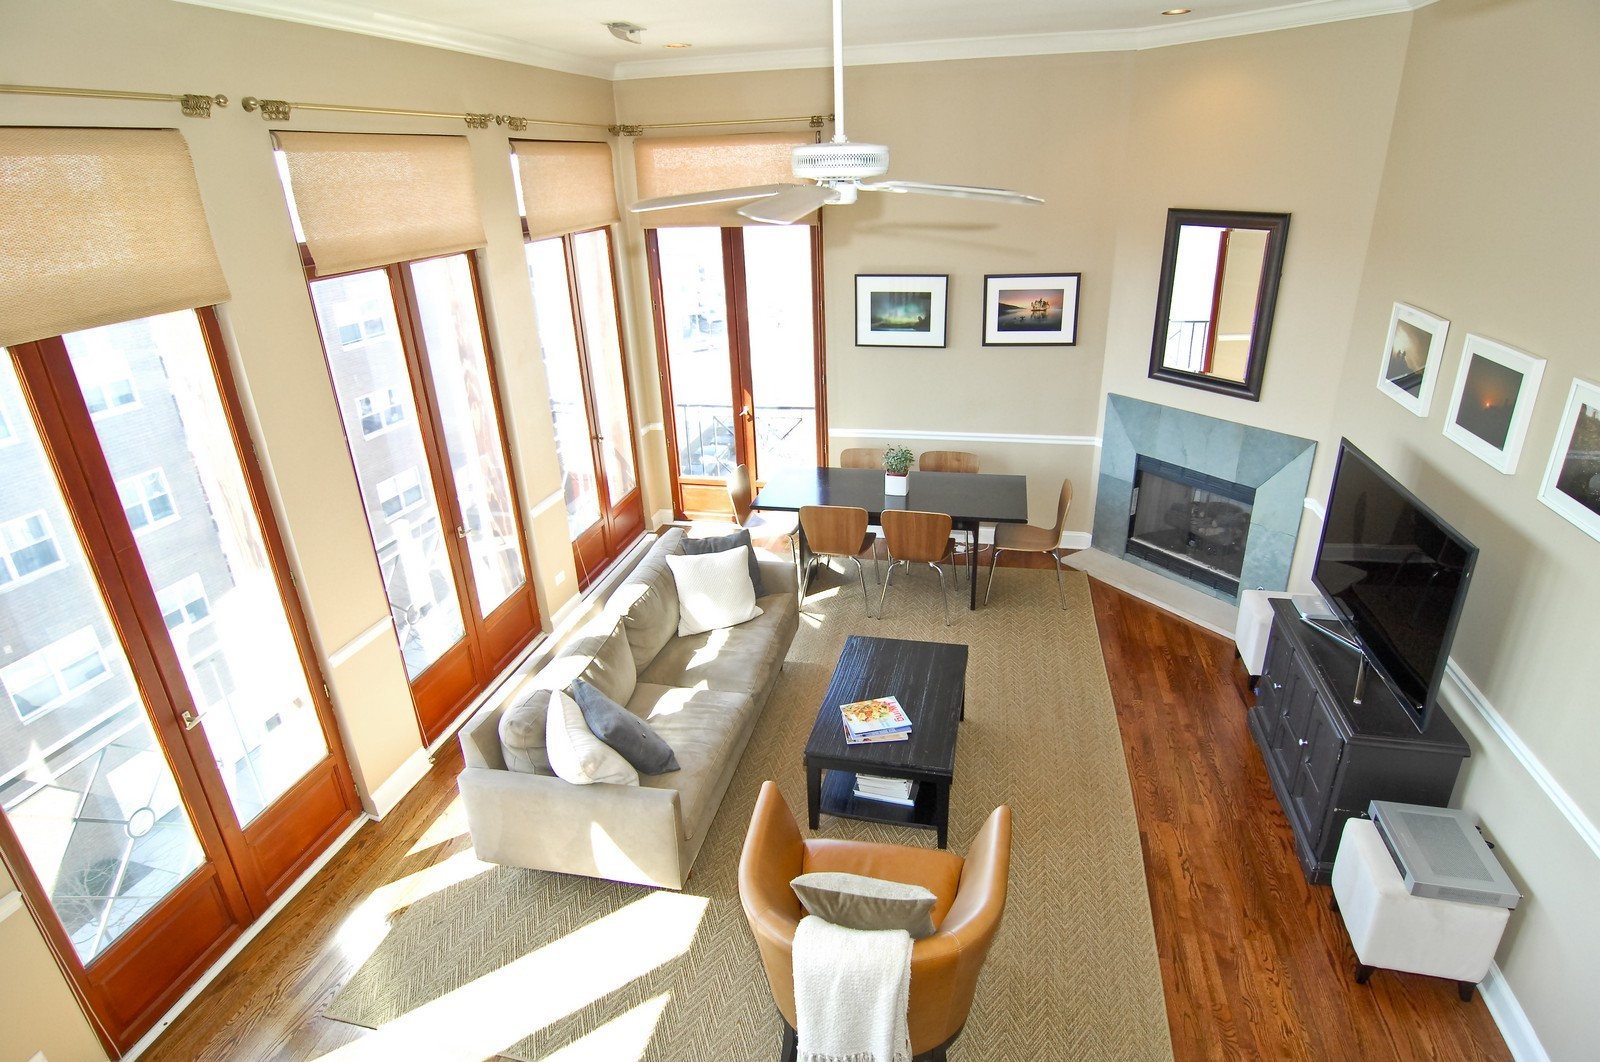 Real Estate Photography - 1865 N Winnebago, Unit 4, Chicago, IL, 60647 - Location 6